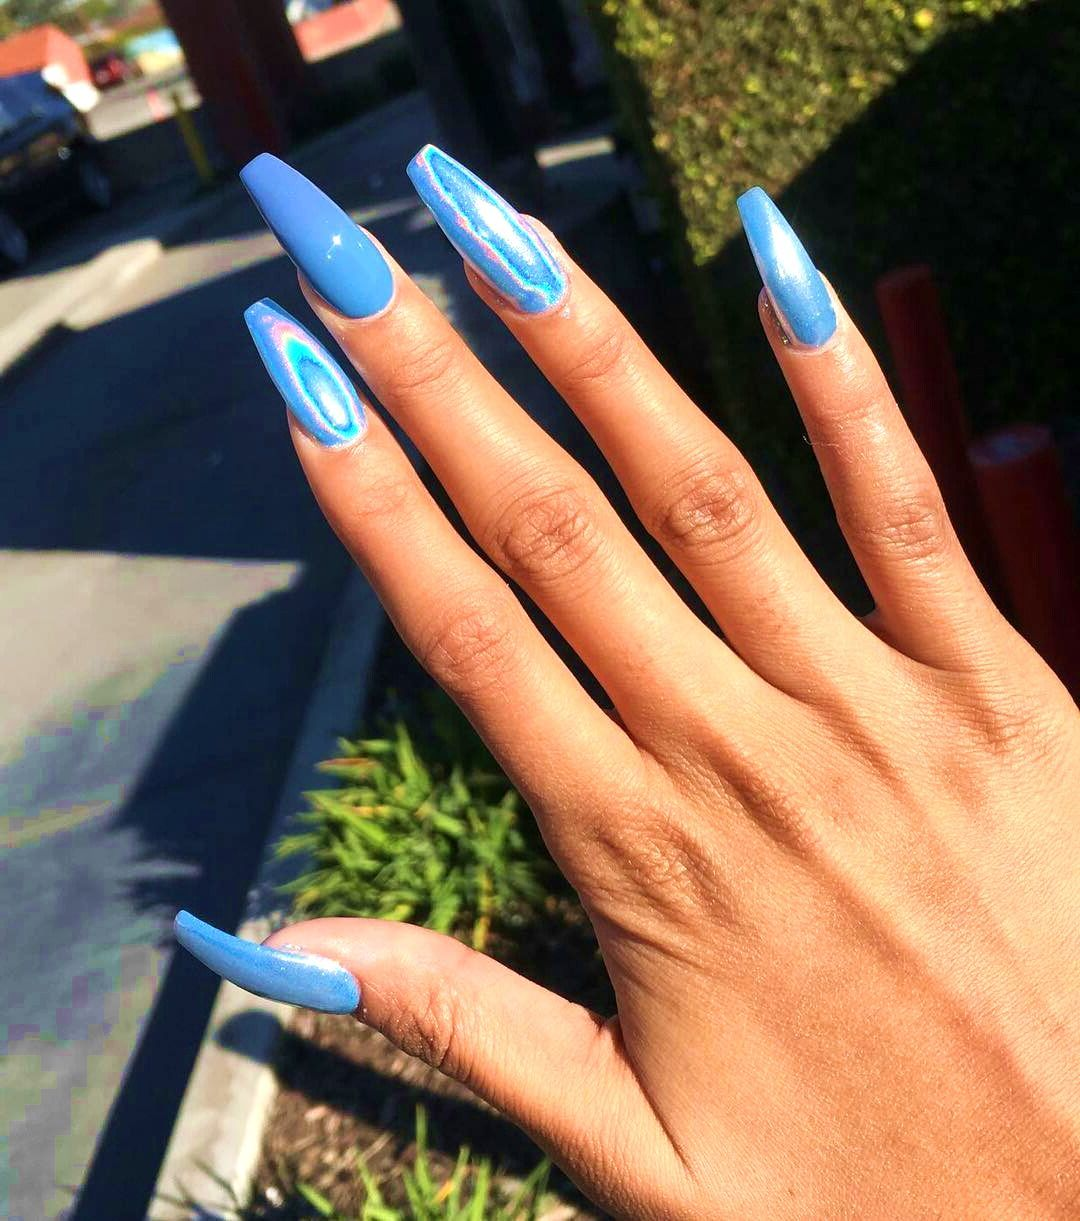 35 Cutest Nail Designs For Summer Nail Designs Summer Acrylic Cute Nail Designs Nail Designs Summer